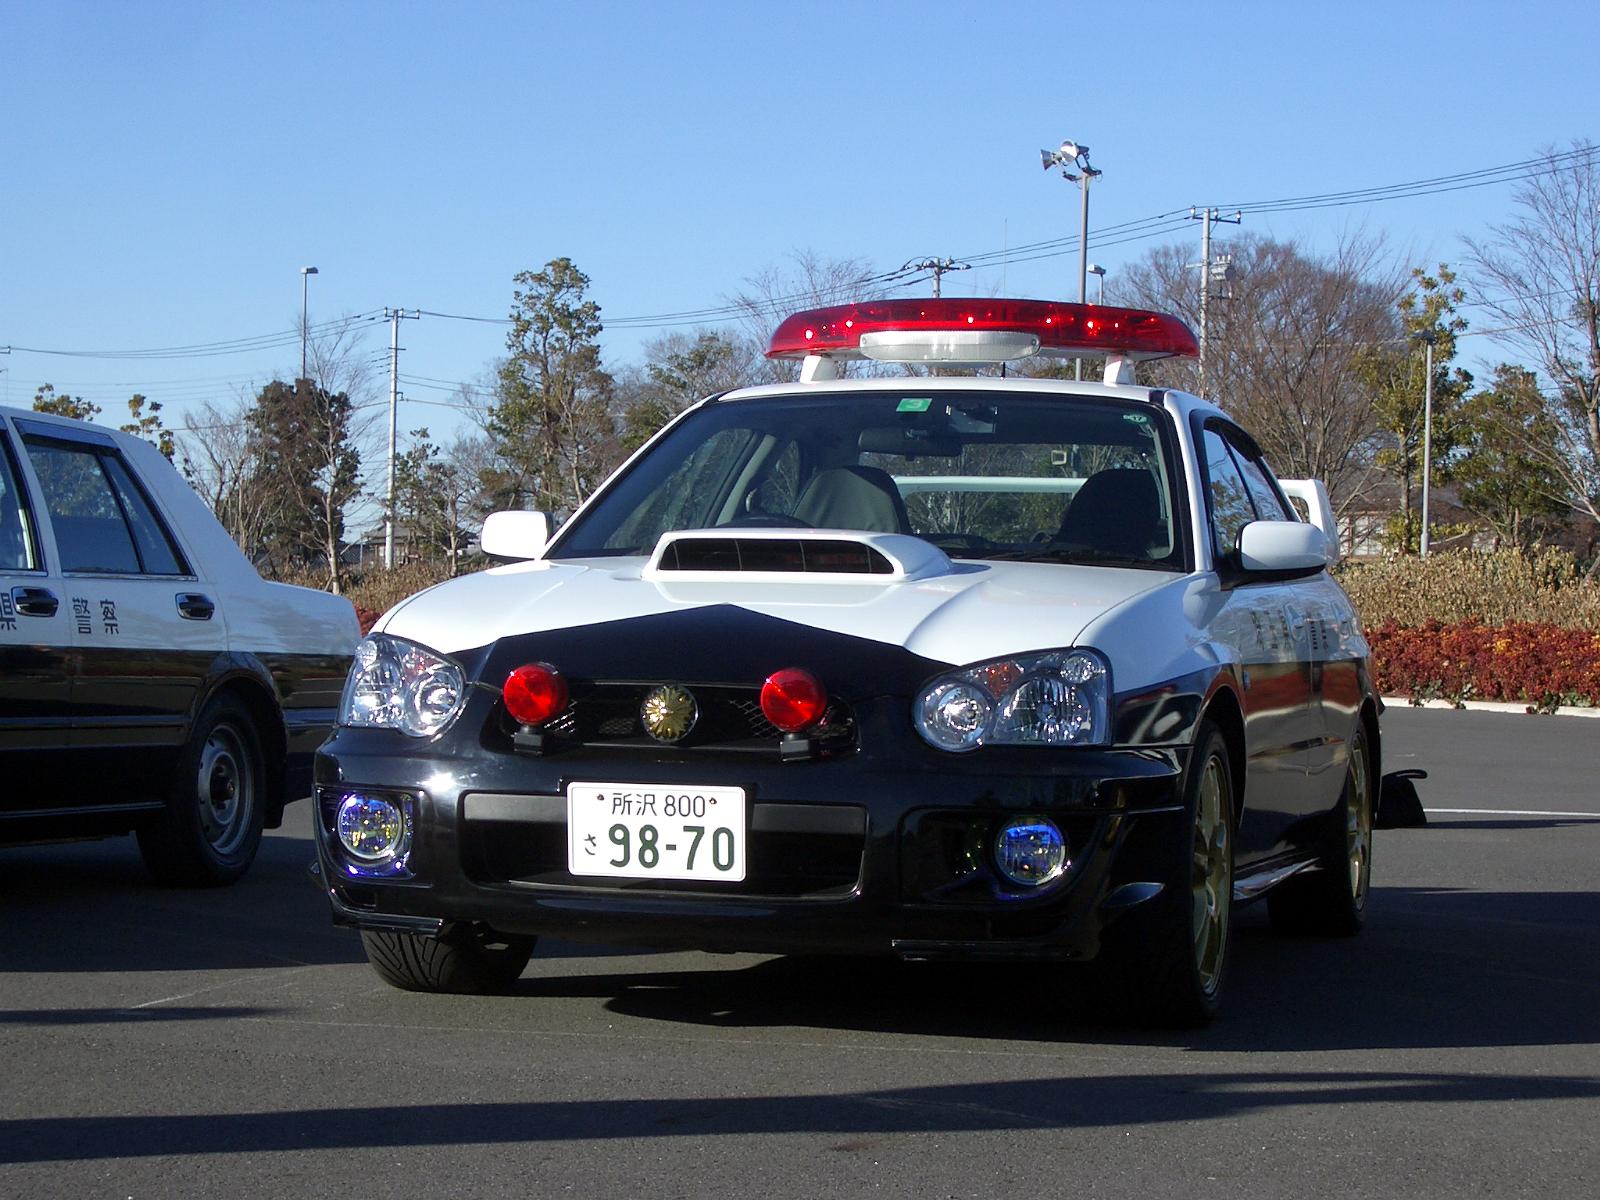 File Japanese Subaru Impreza Wrx Sti Police Car Jpg Wikimedia Commons